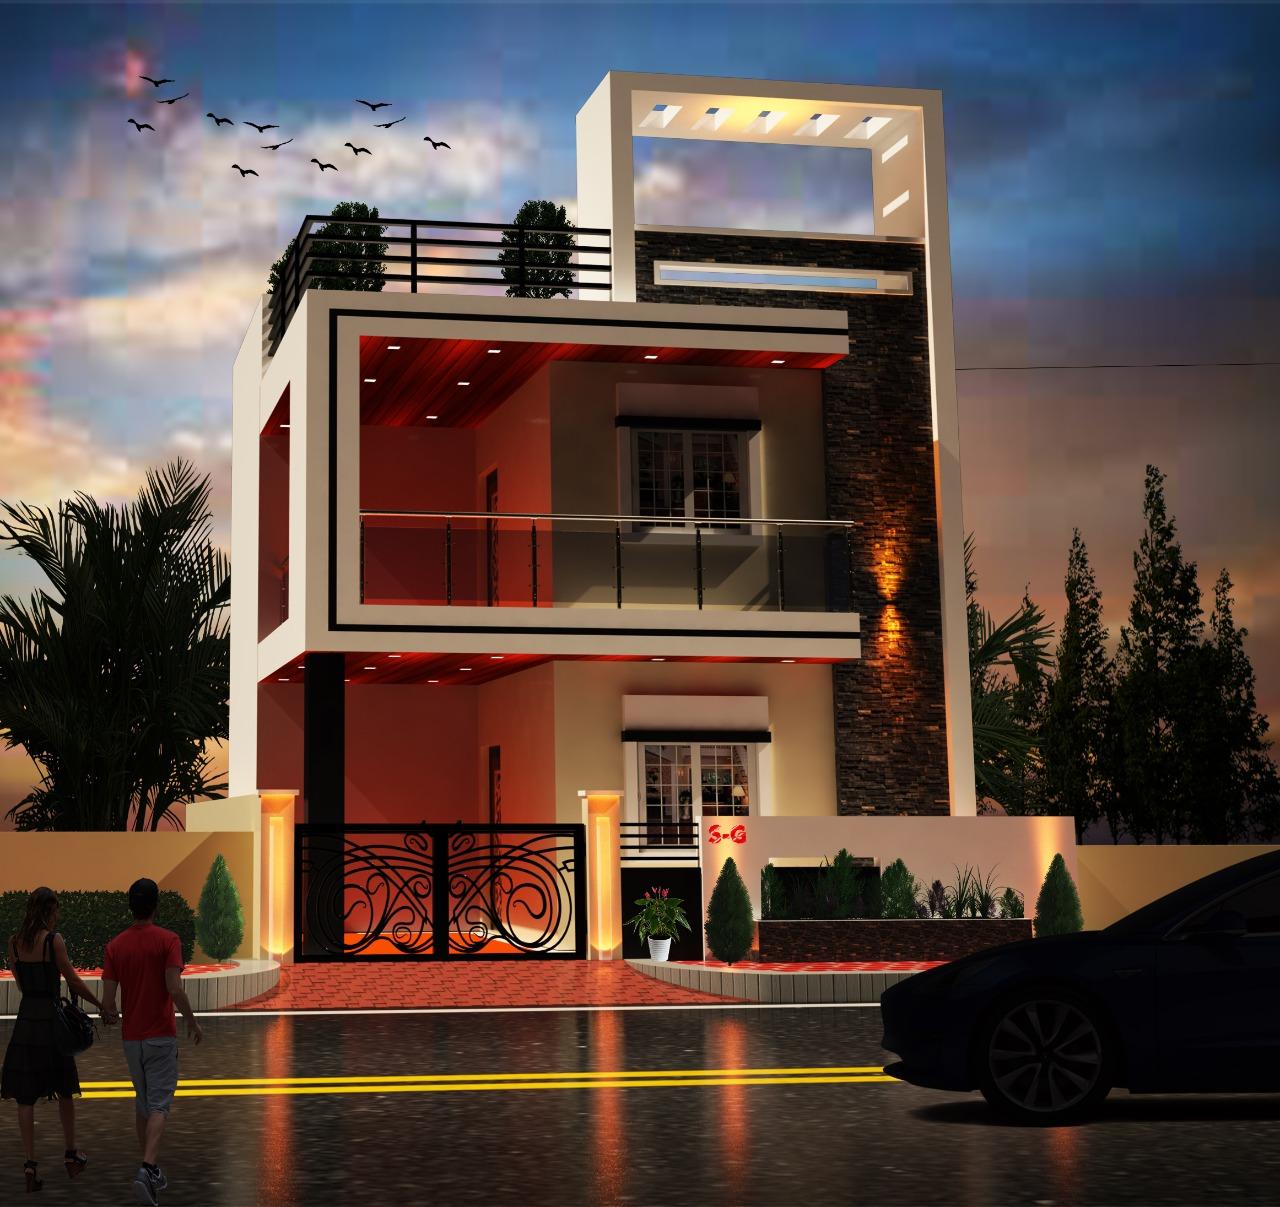 design-centre-institute-of-crativity-and-innovation-student-work-civil-and-interior-deign-manish-goud